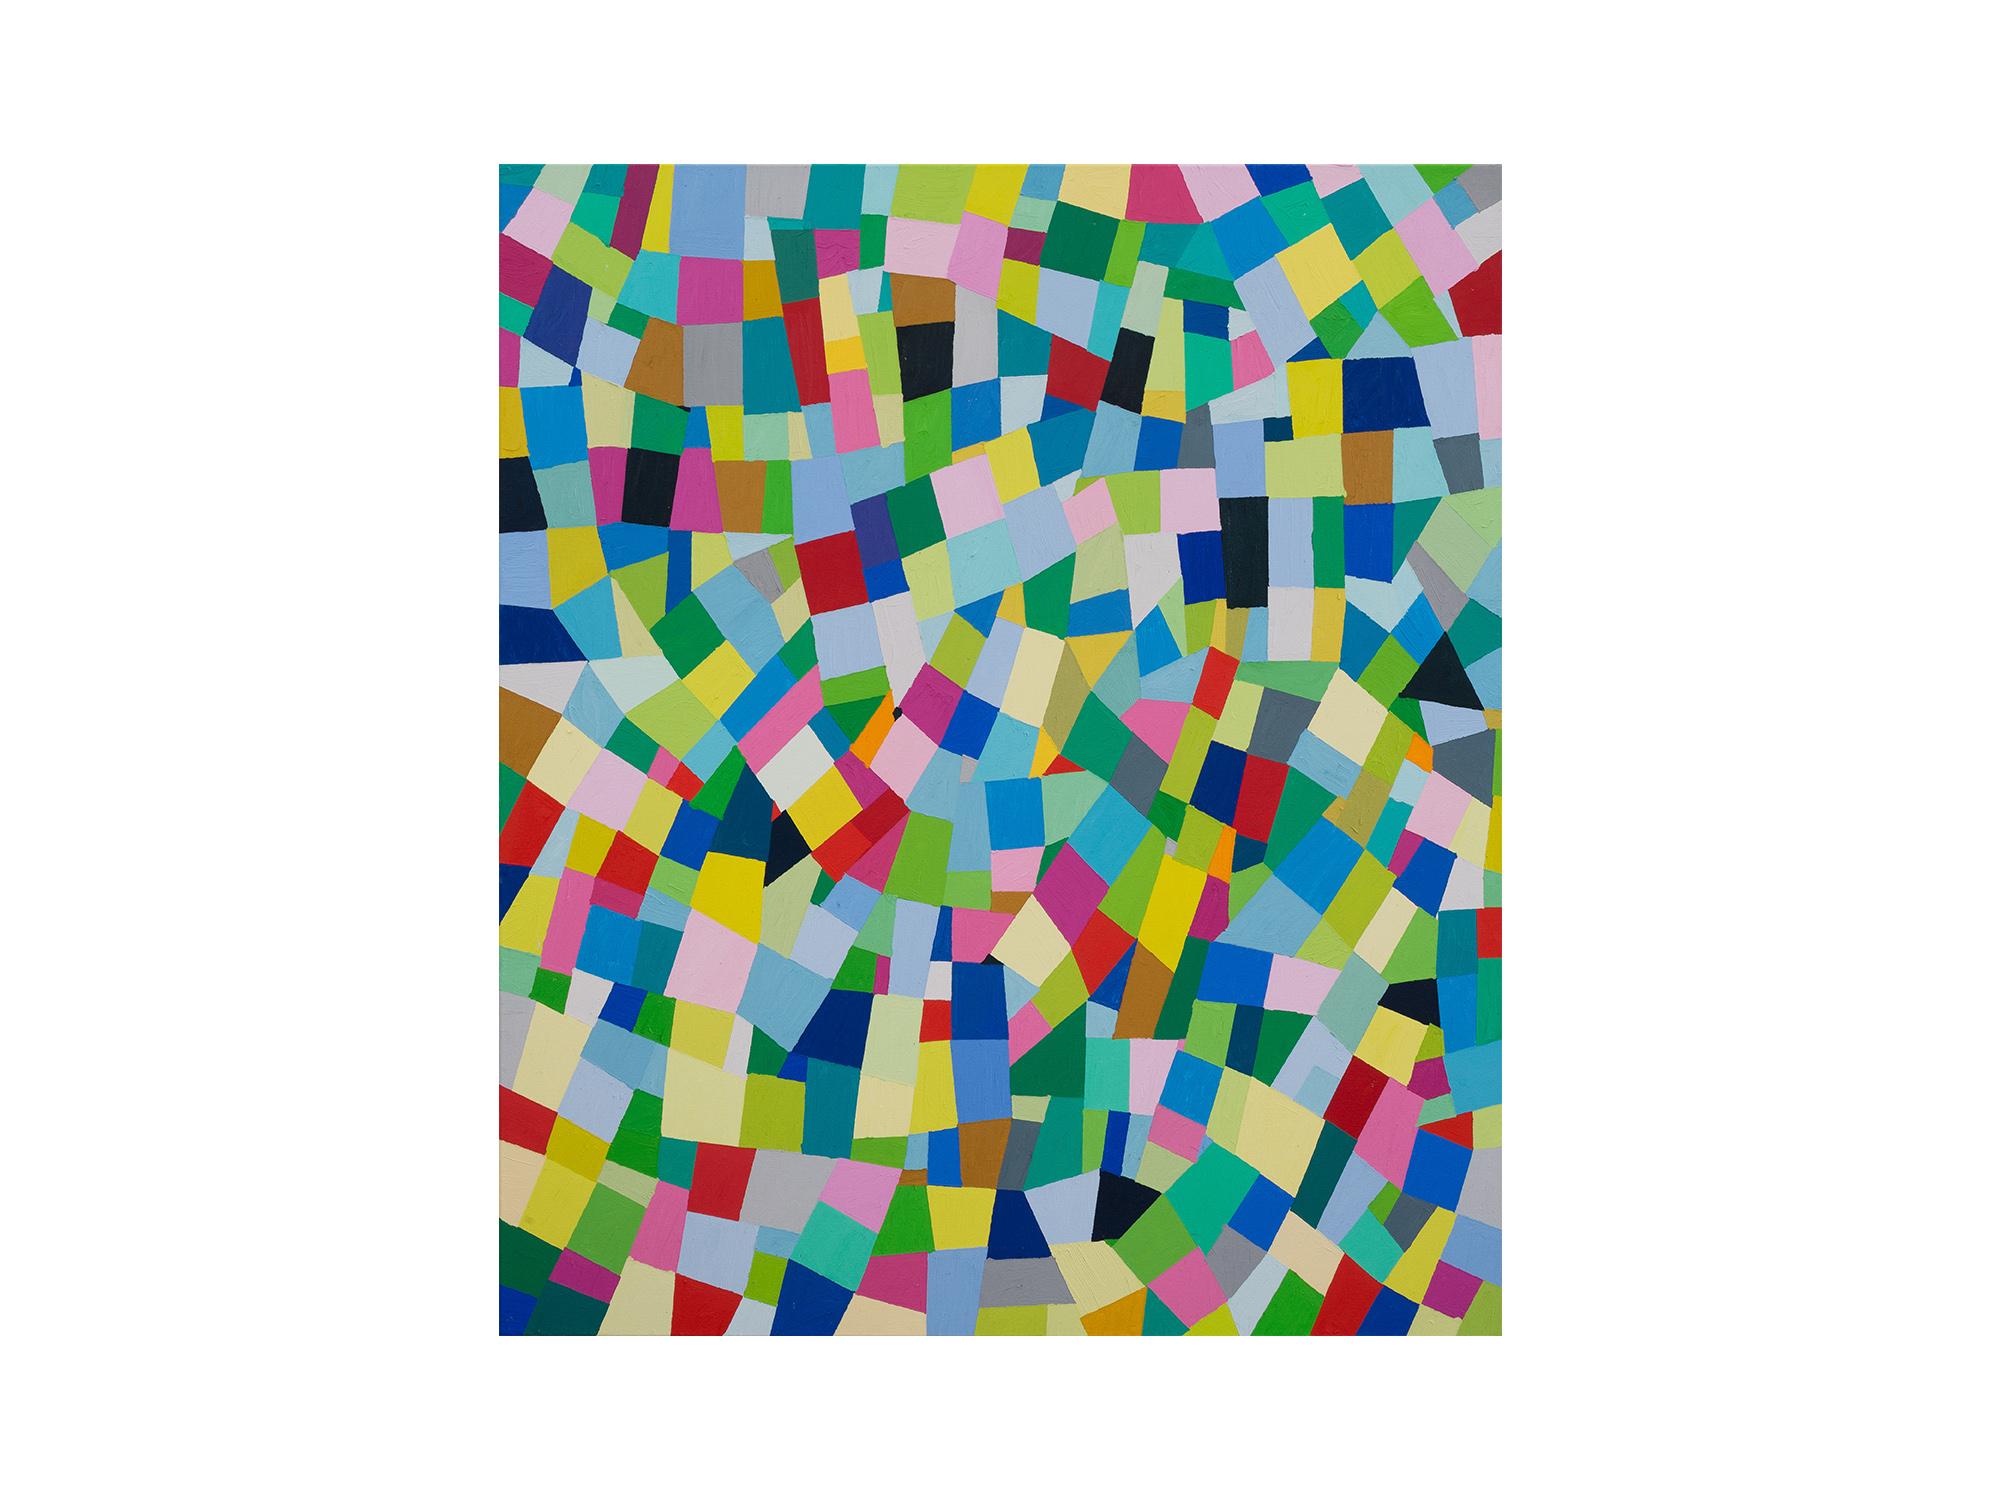 Melinda Harper   Untitled , 2018 oil on canvas 122 x 106.5cm   ARTIST BIO